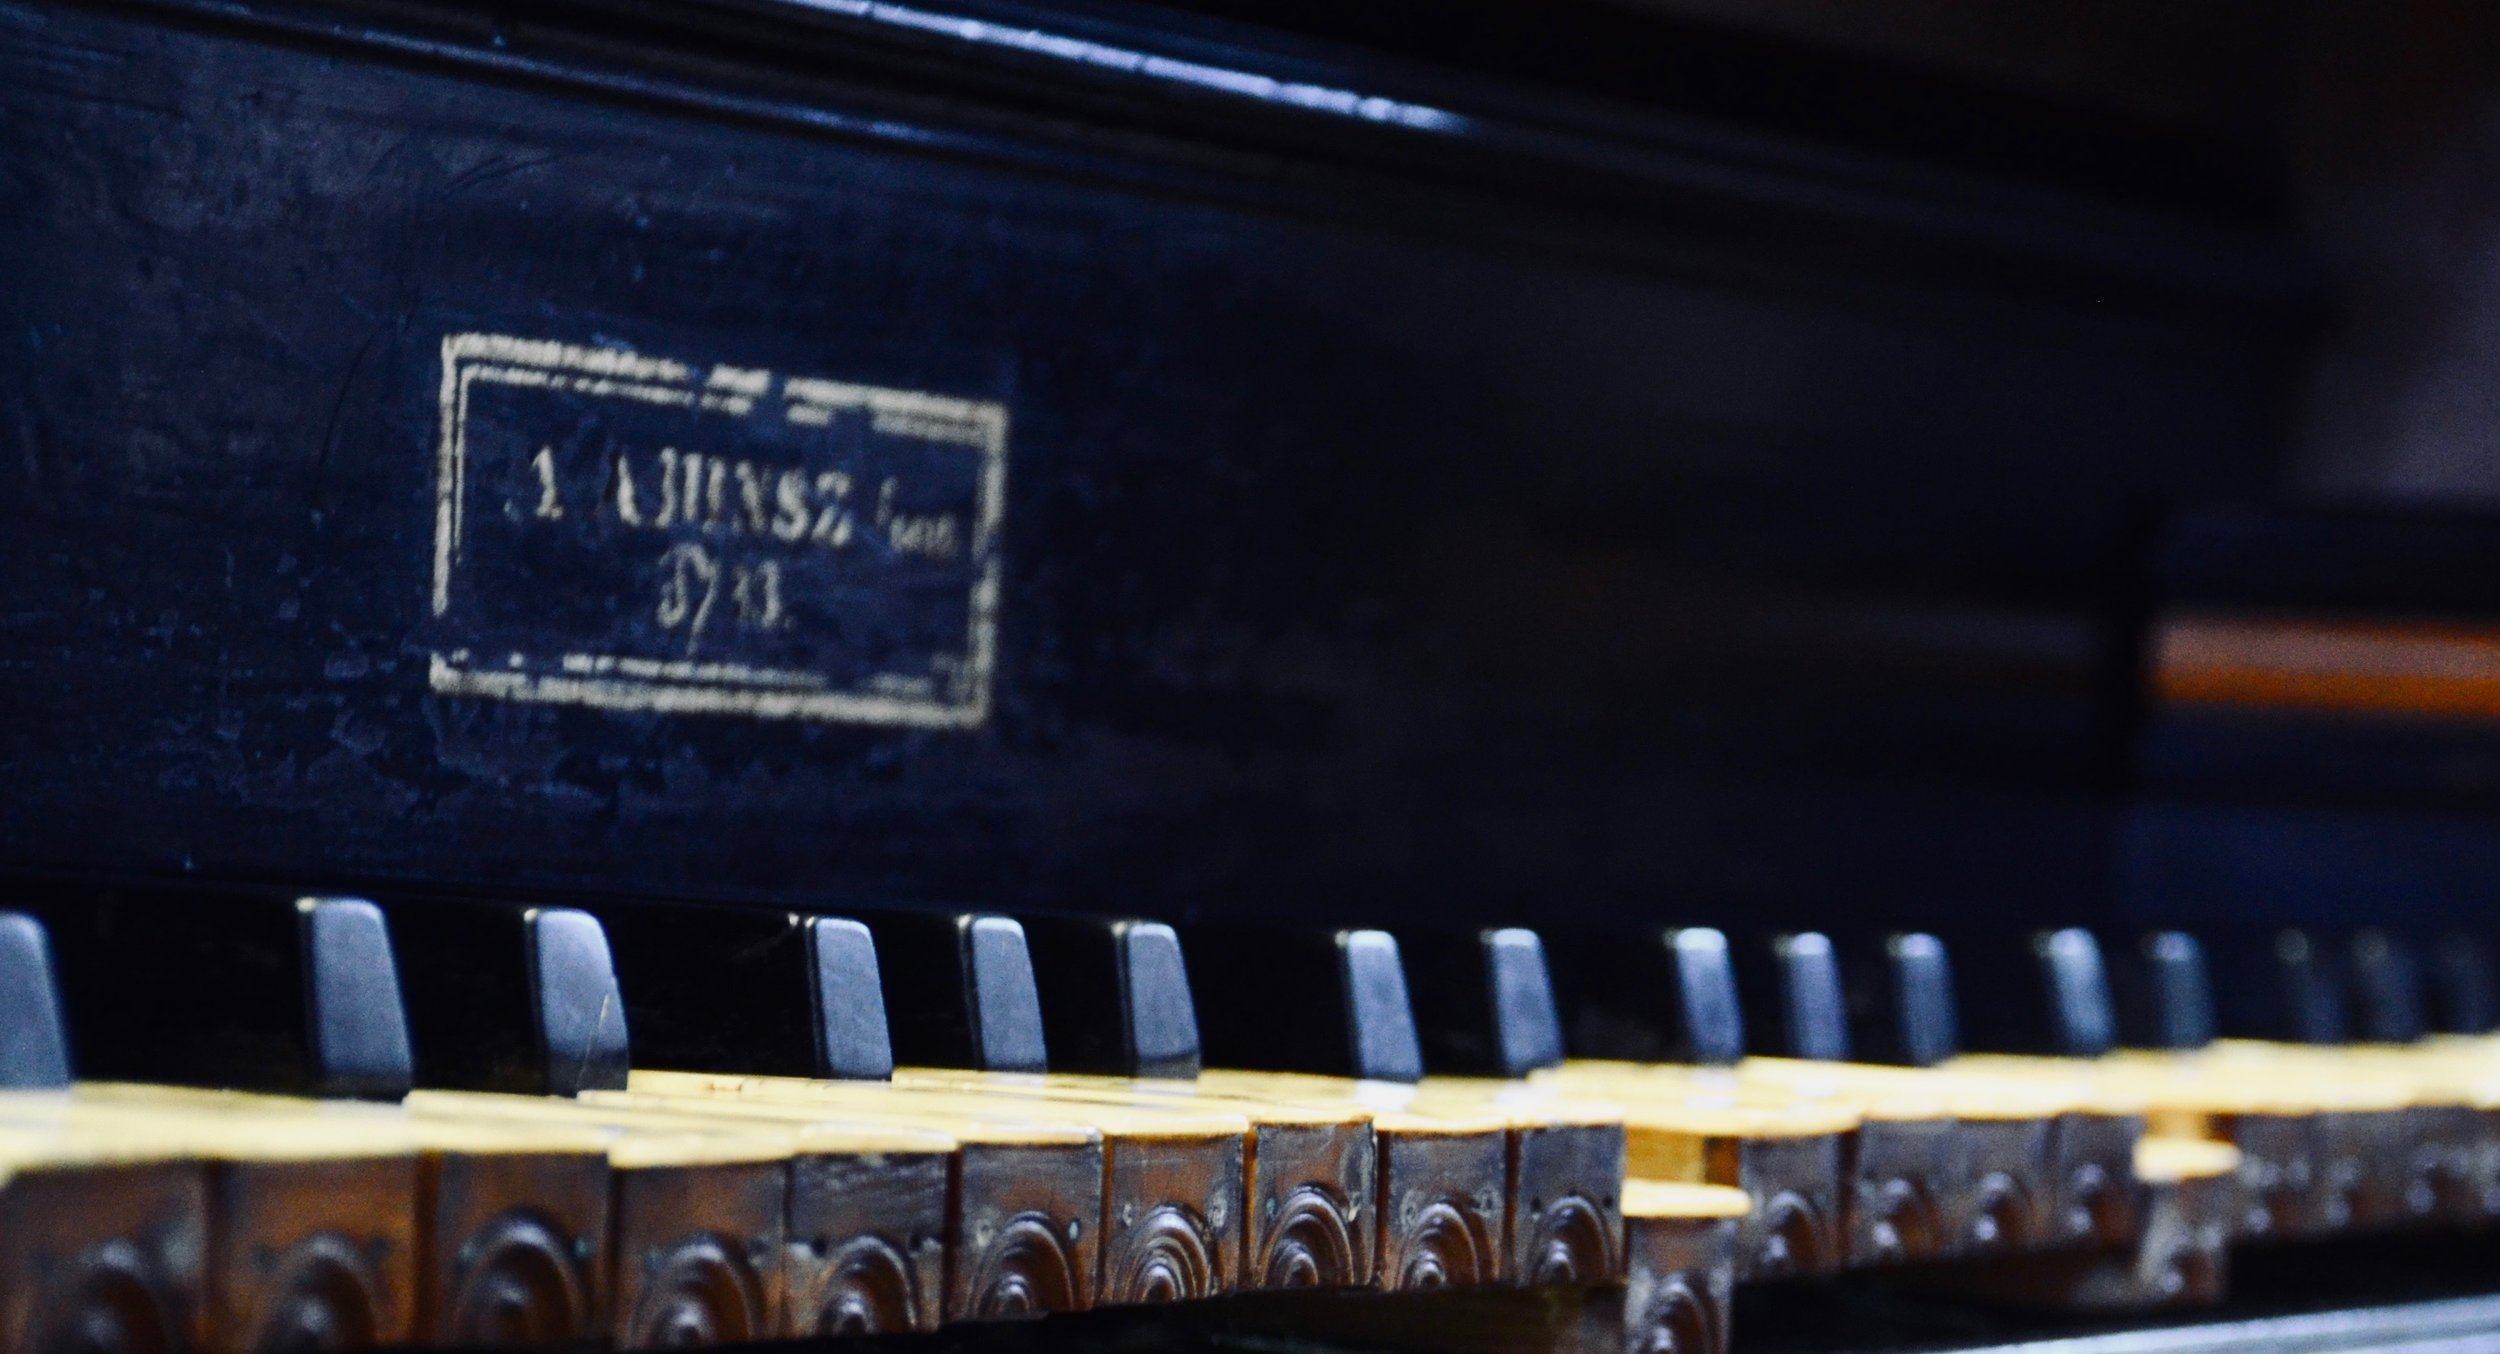 Keydesk detail, 1733 Hinsz organ, Leens, Holland.